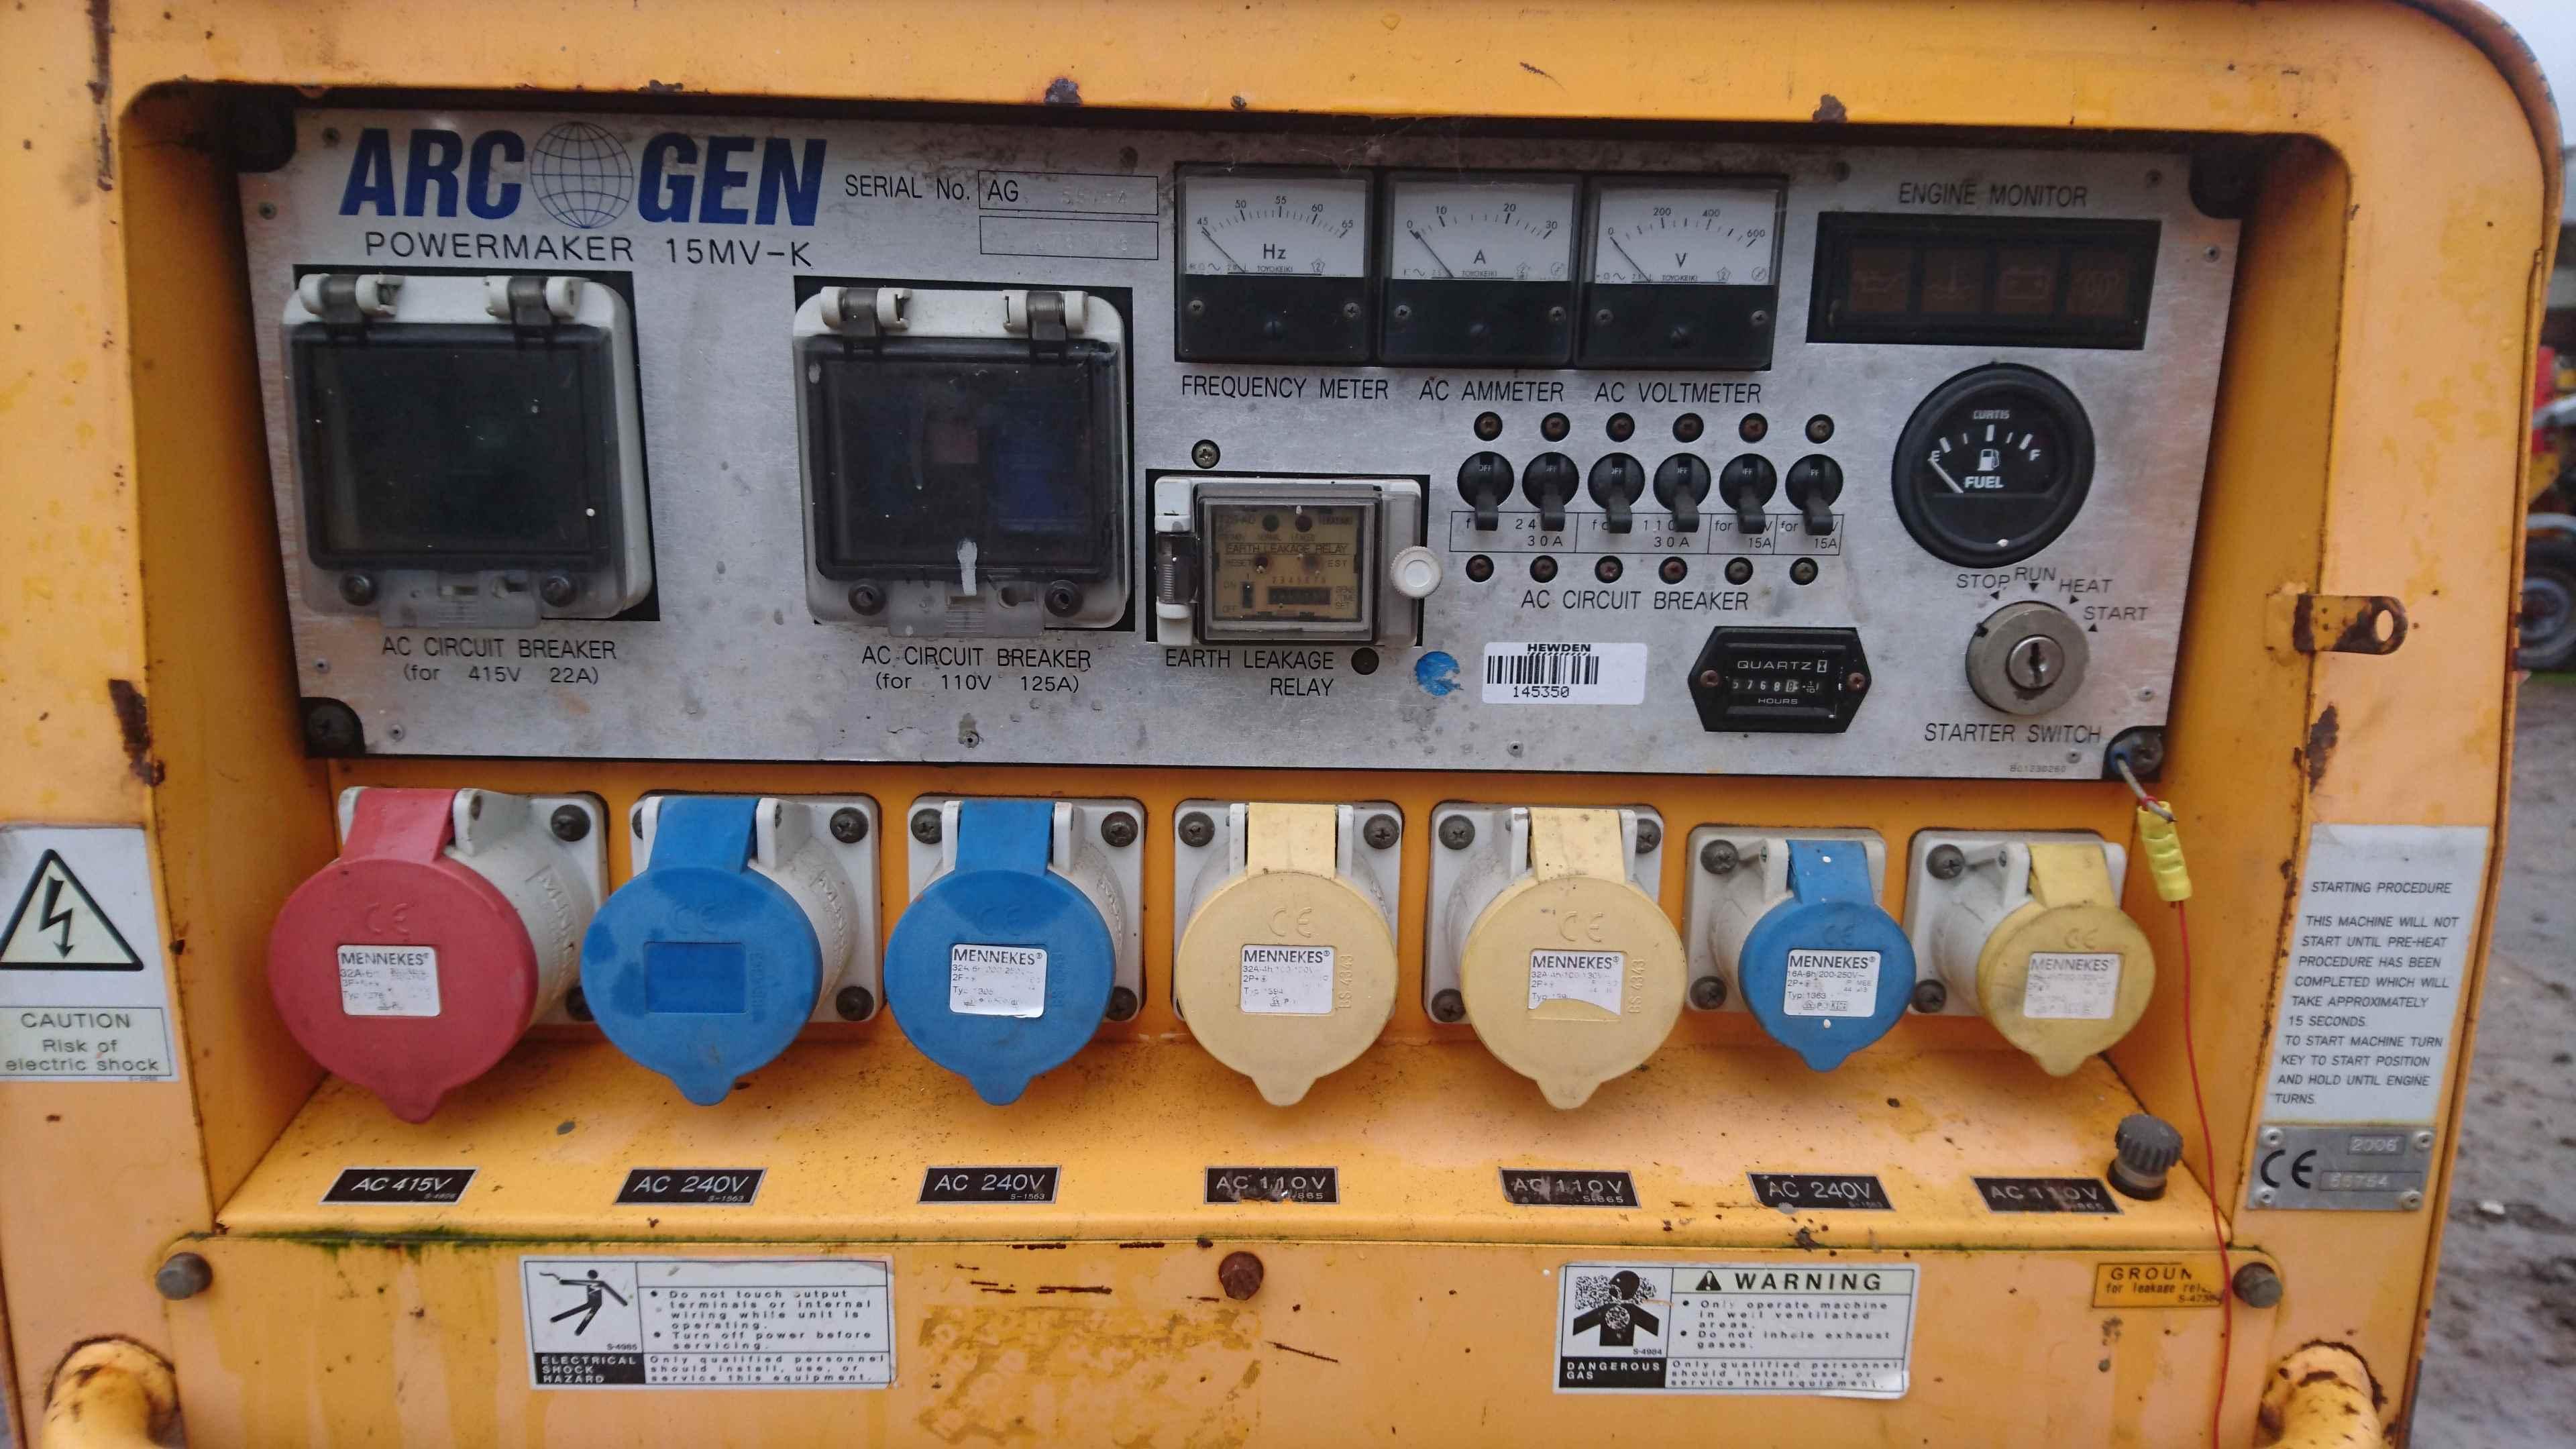 Arc Gen Powermaker 15MV K Diesel Generator 15Kva 3 Phase 240v and